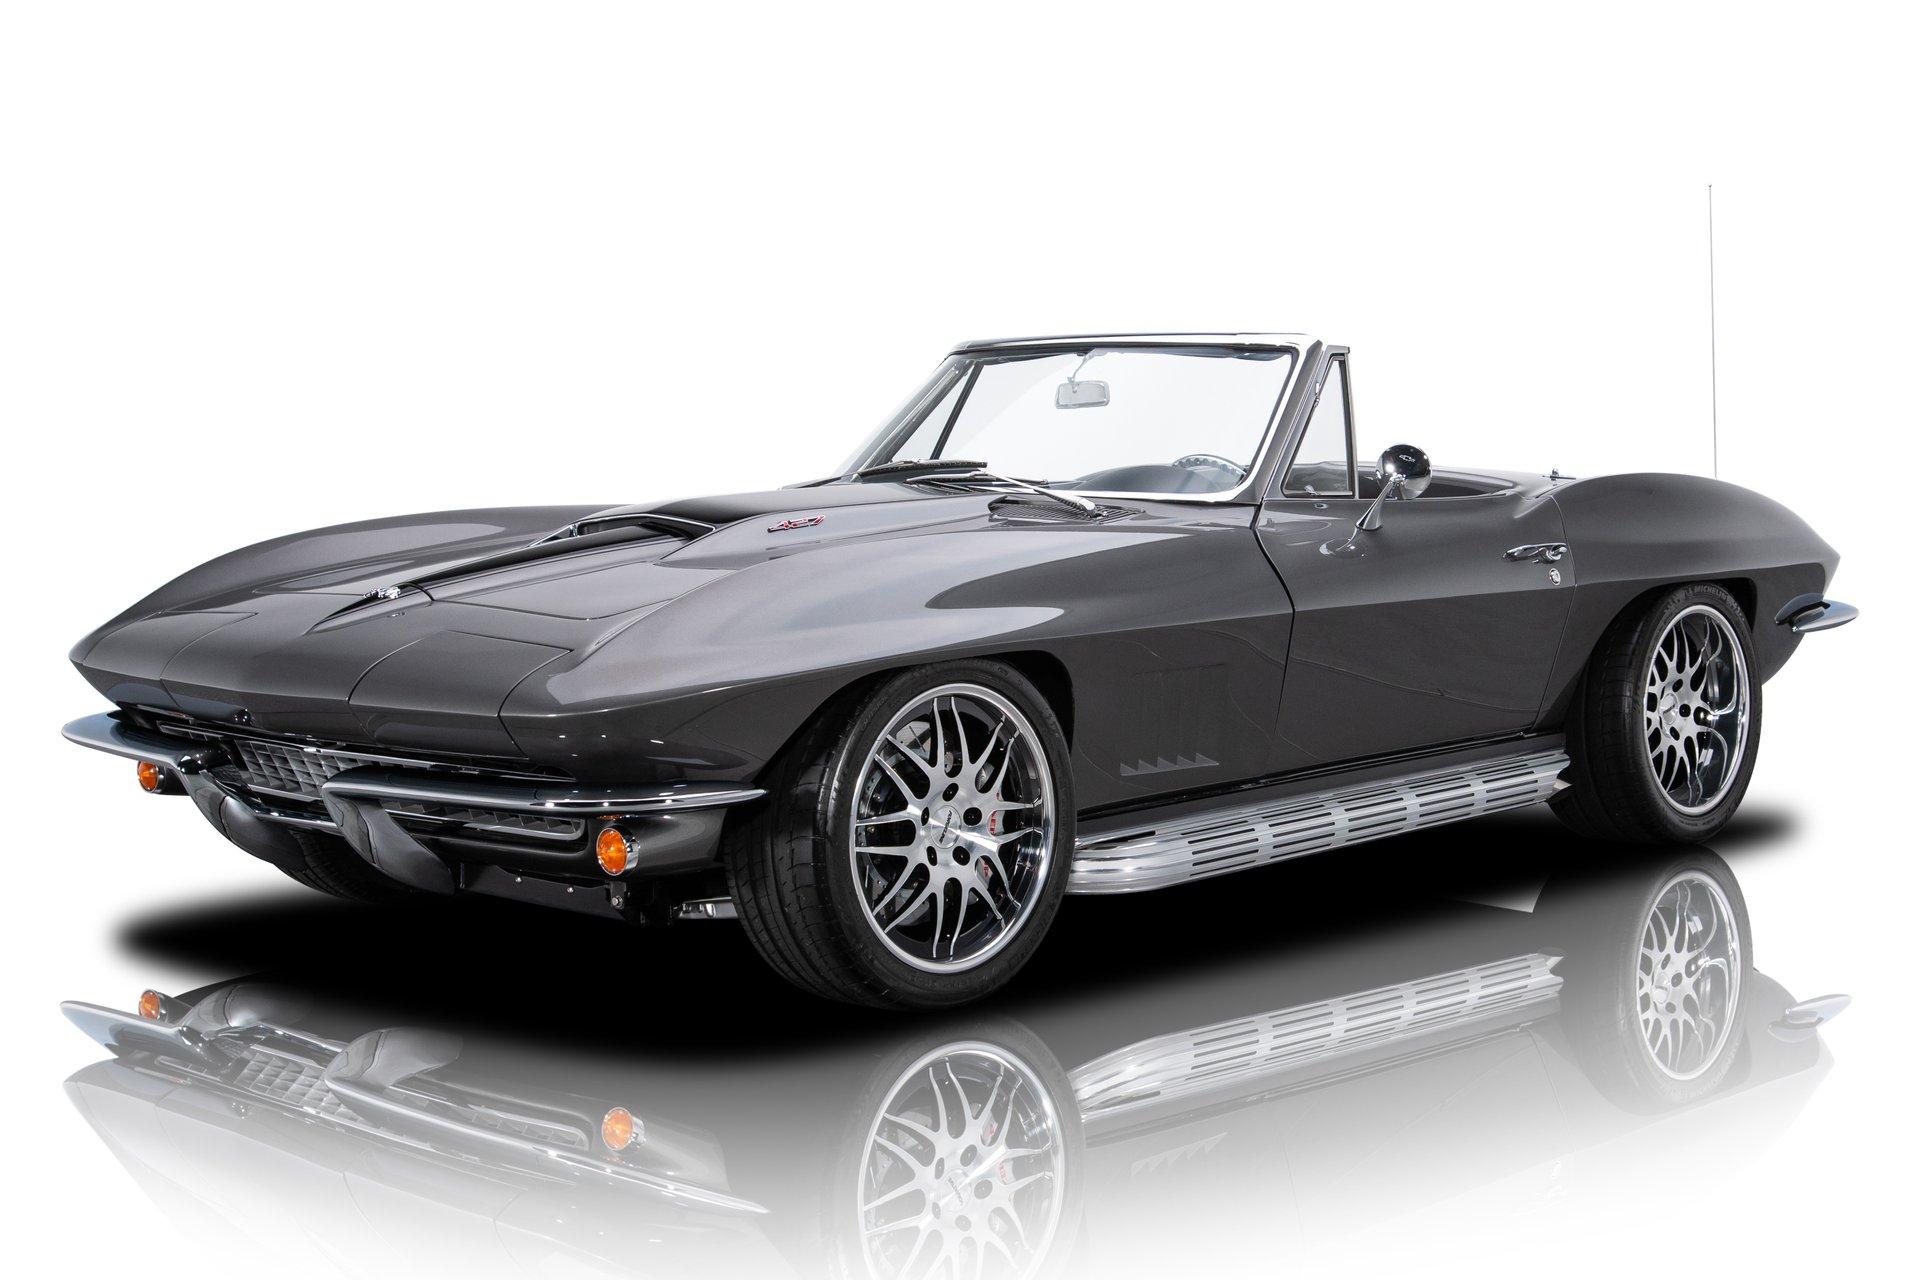 136536 1967 Chevrolet Corvette RK Motors Classic Cars for Sale